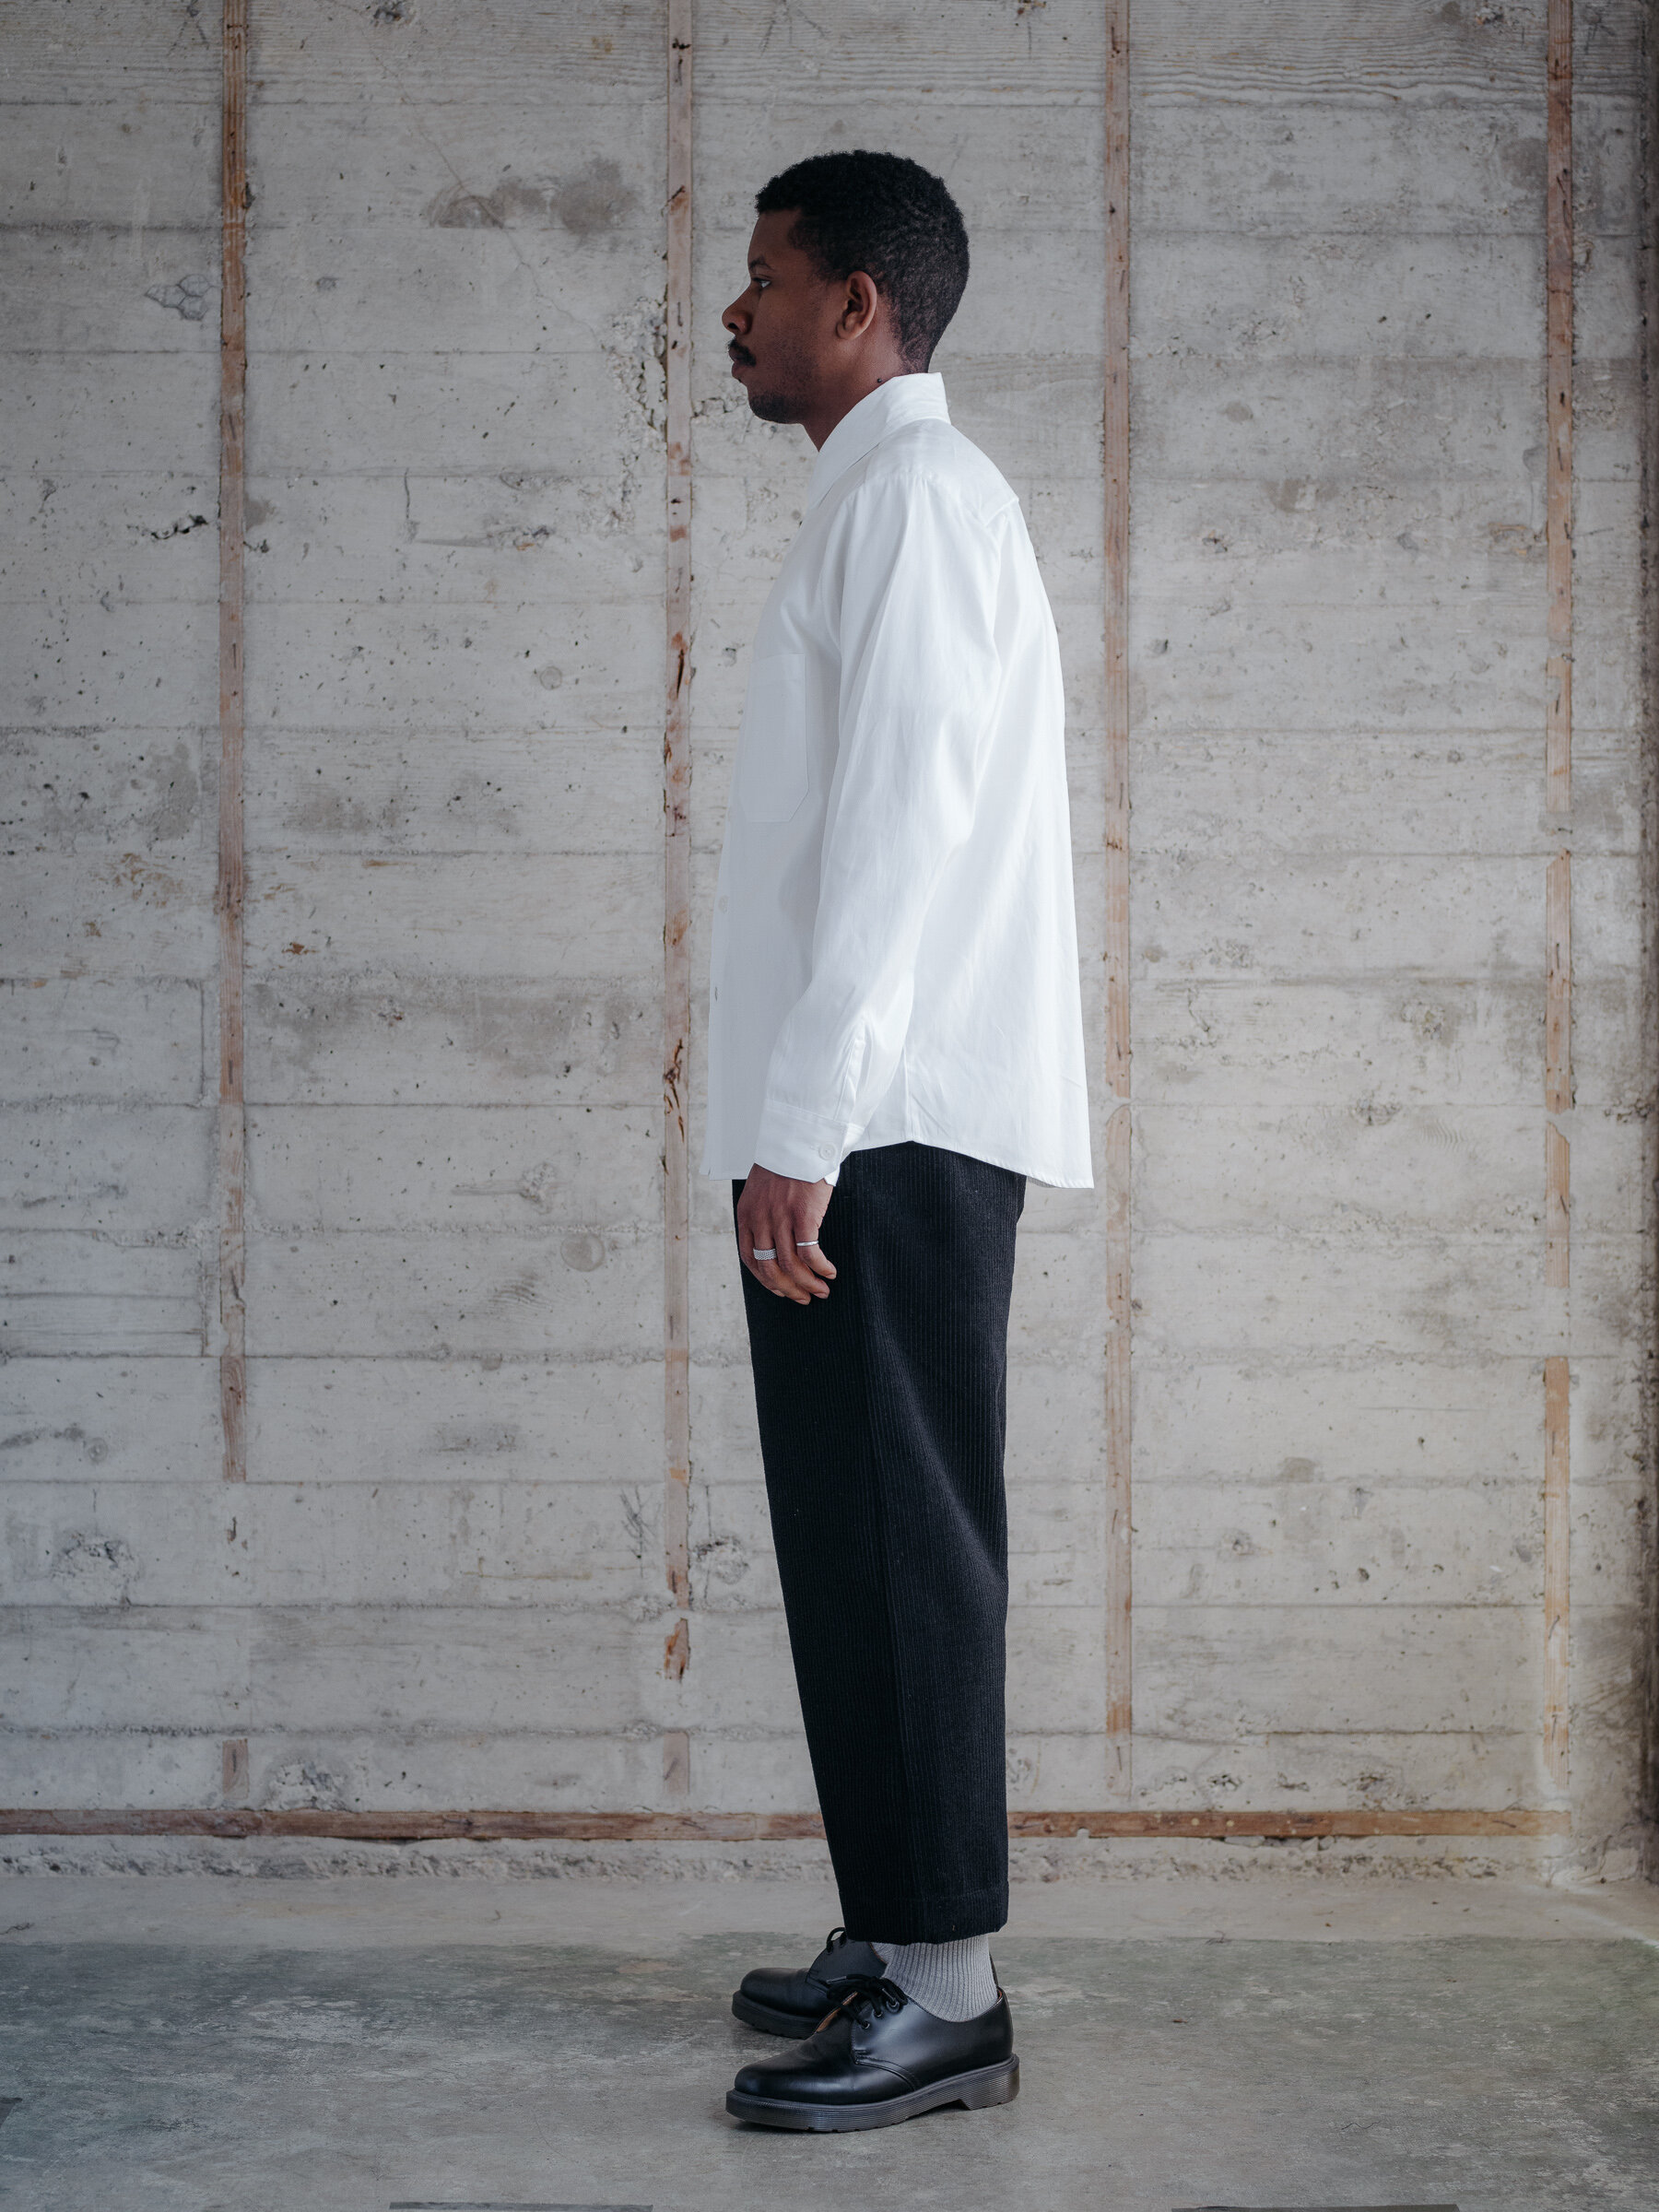 evan-kinori-two-pocket-shirt-organic-cotton-hemp-oxford-1evan-kinori-two-pocket-shirt-organic-cotton-hemp-oxford-2